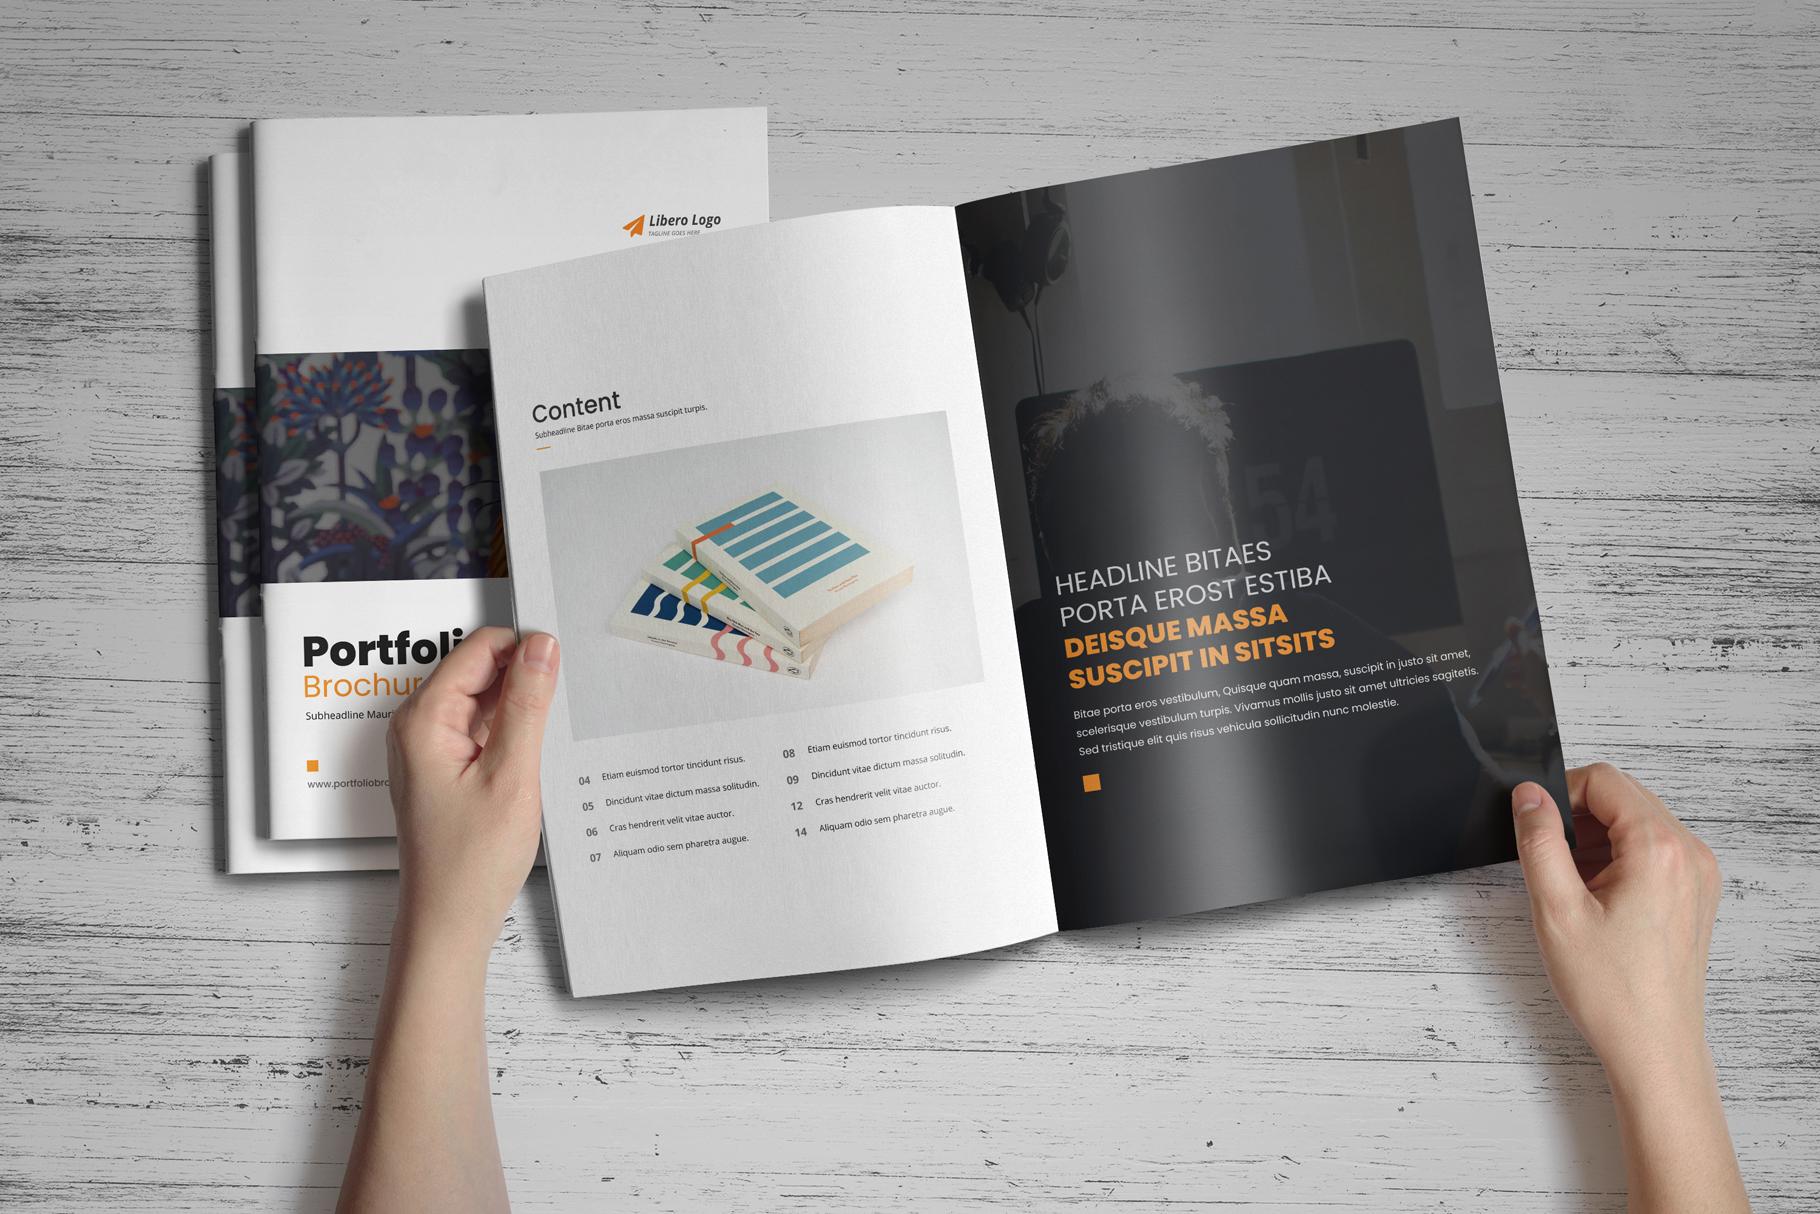 Portfolio Brochure Design v4 example image 2